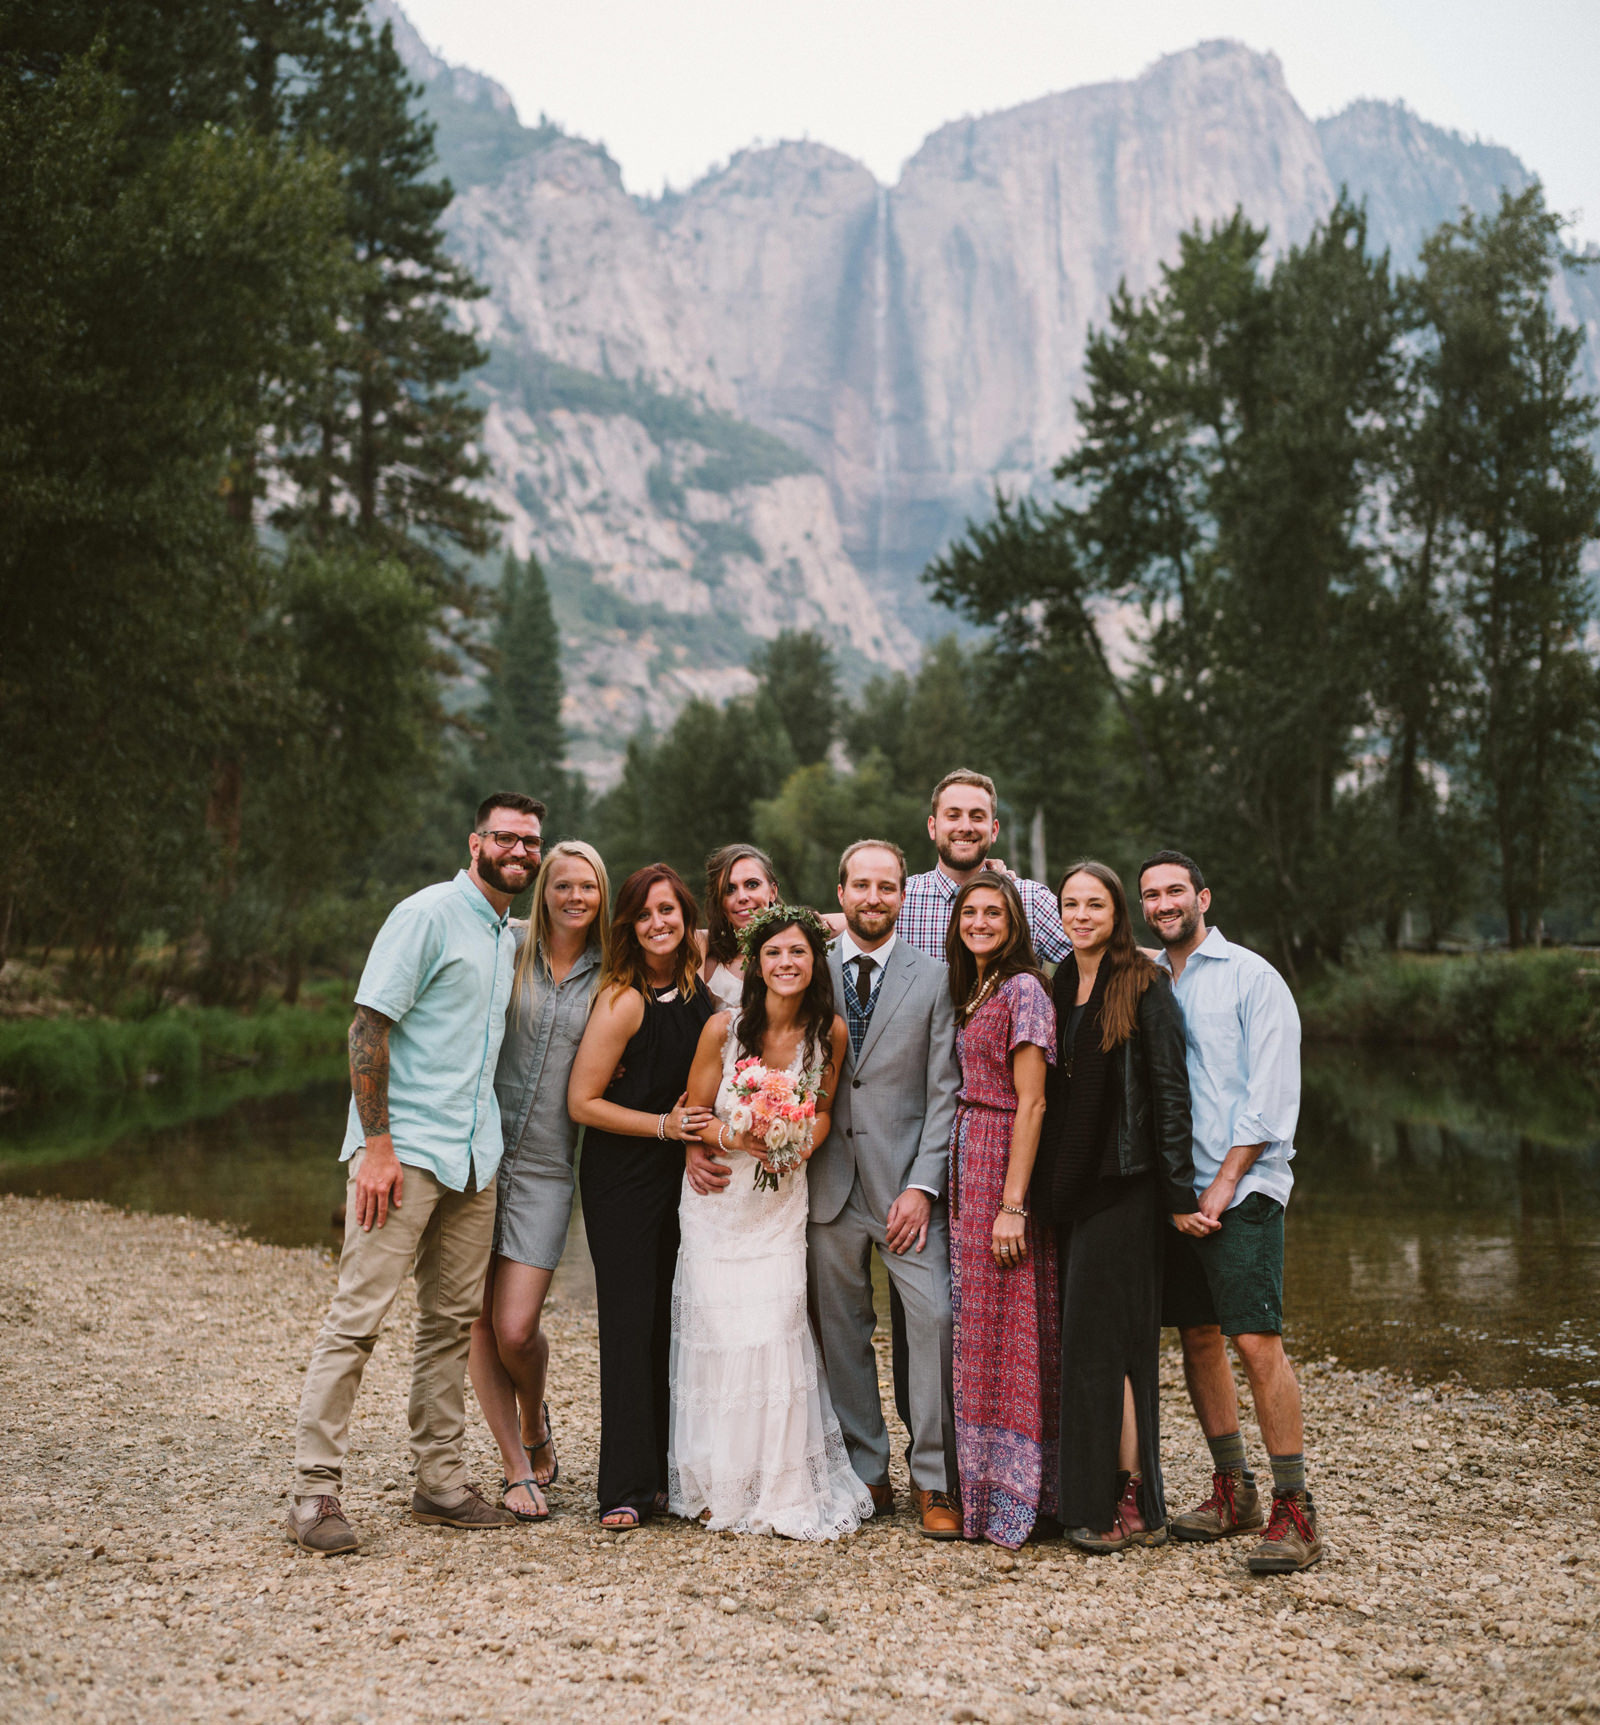 yosemite-intimate-wedding-105 YOSEMITE INTIMATE WEDDING